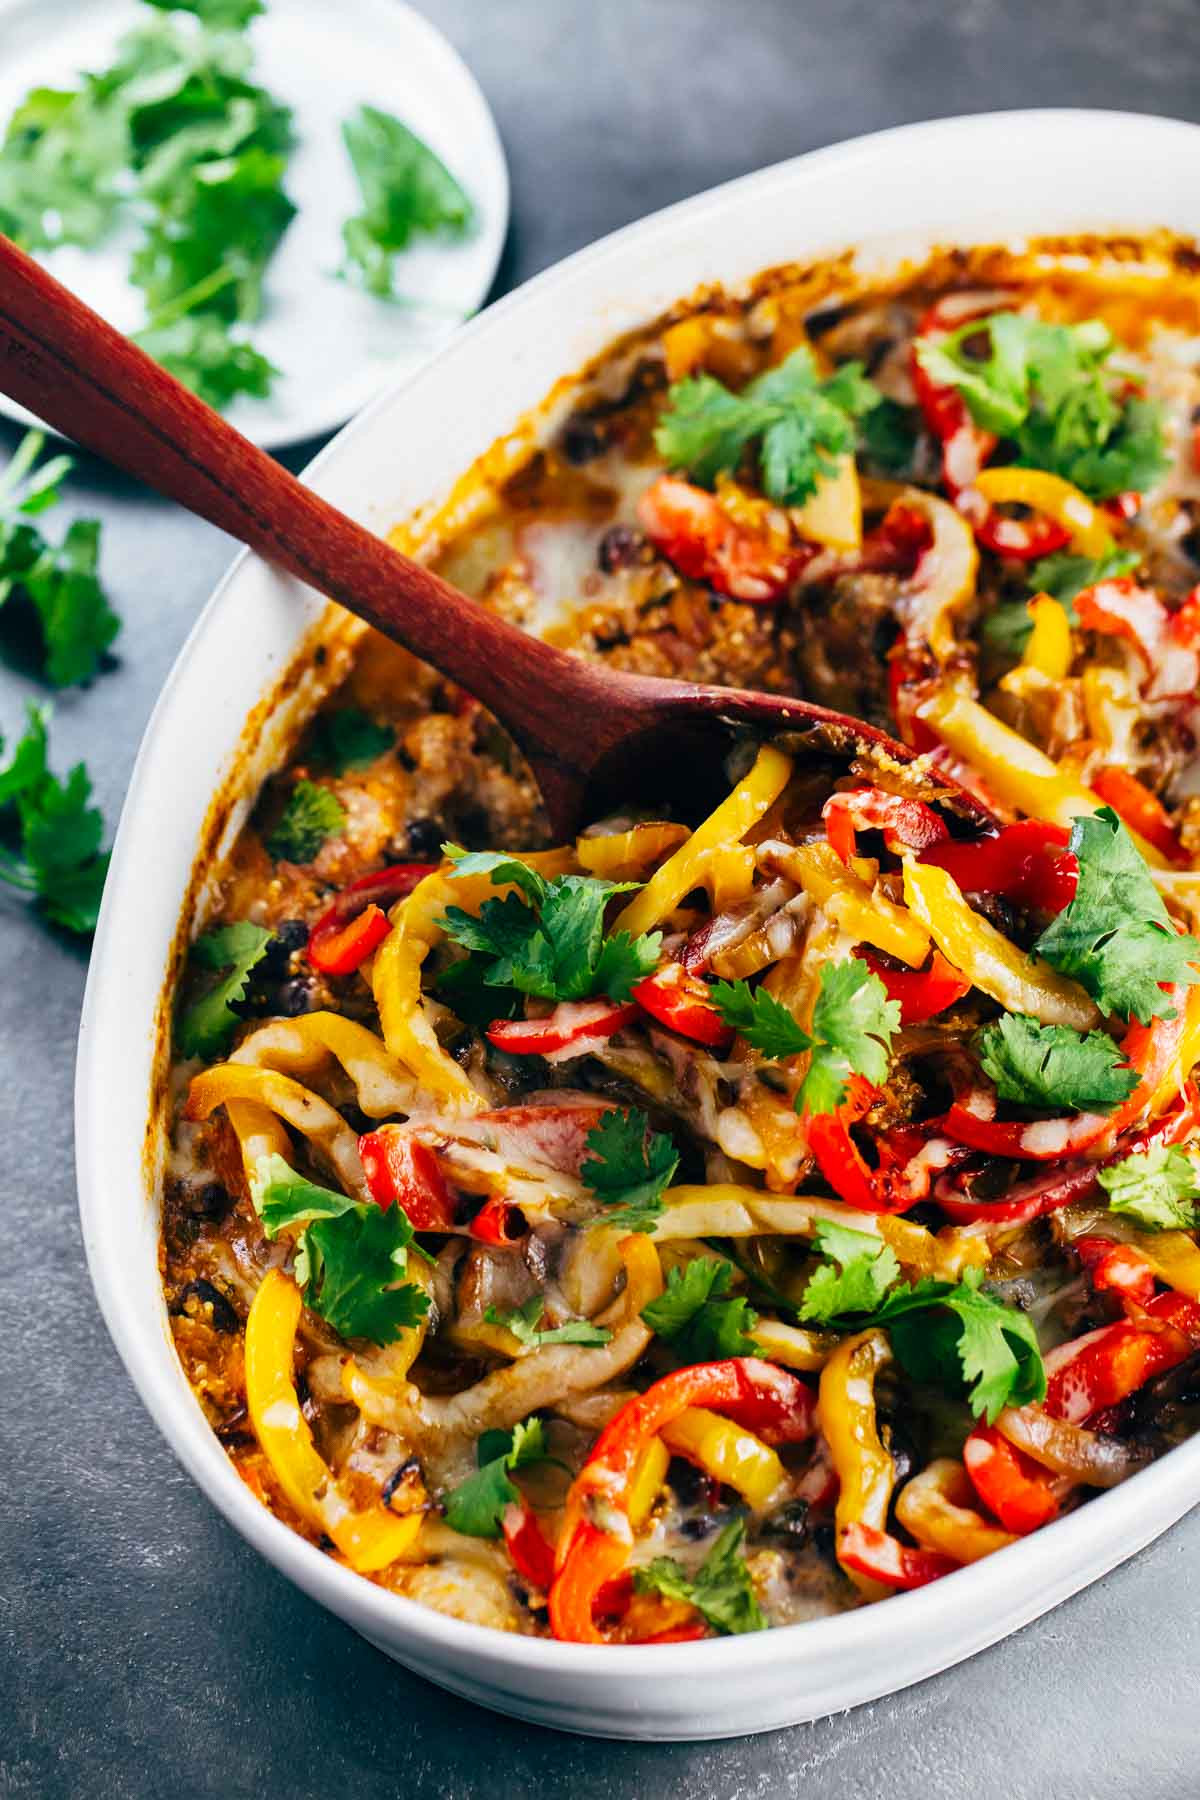 Easy Healthy Mexican Recipes  Easy Mexican Chicken Quinoa Casserole Recipe Pinch of Yum